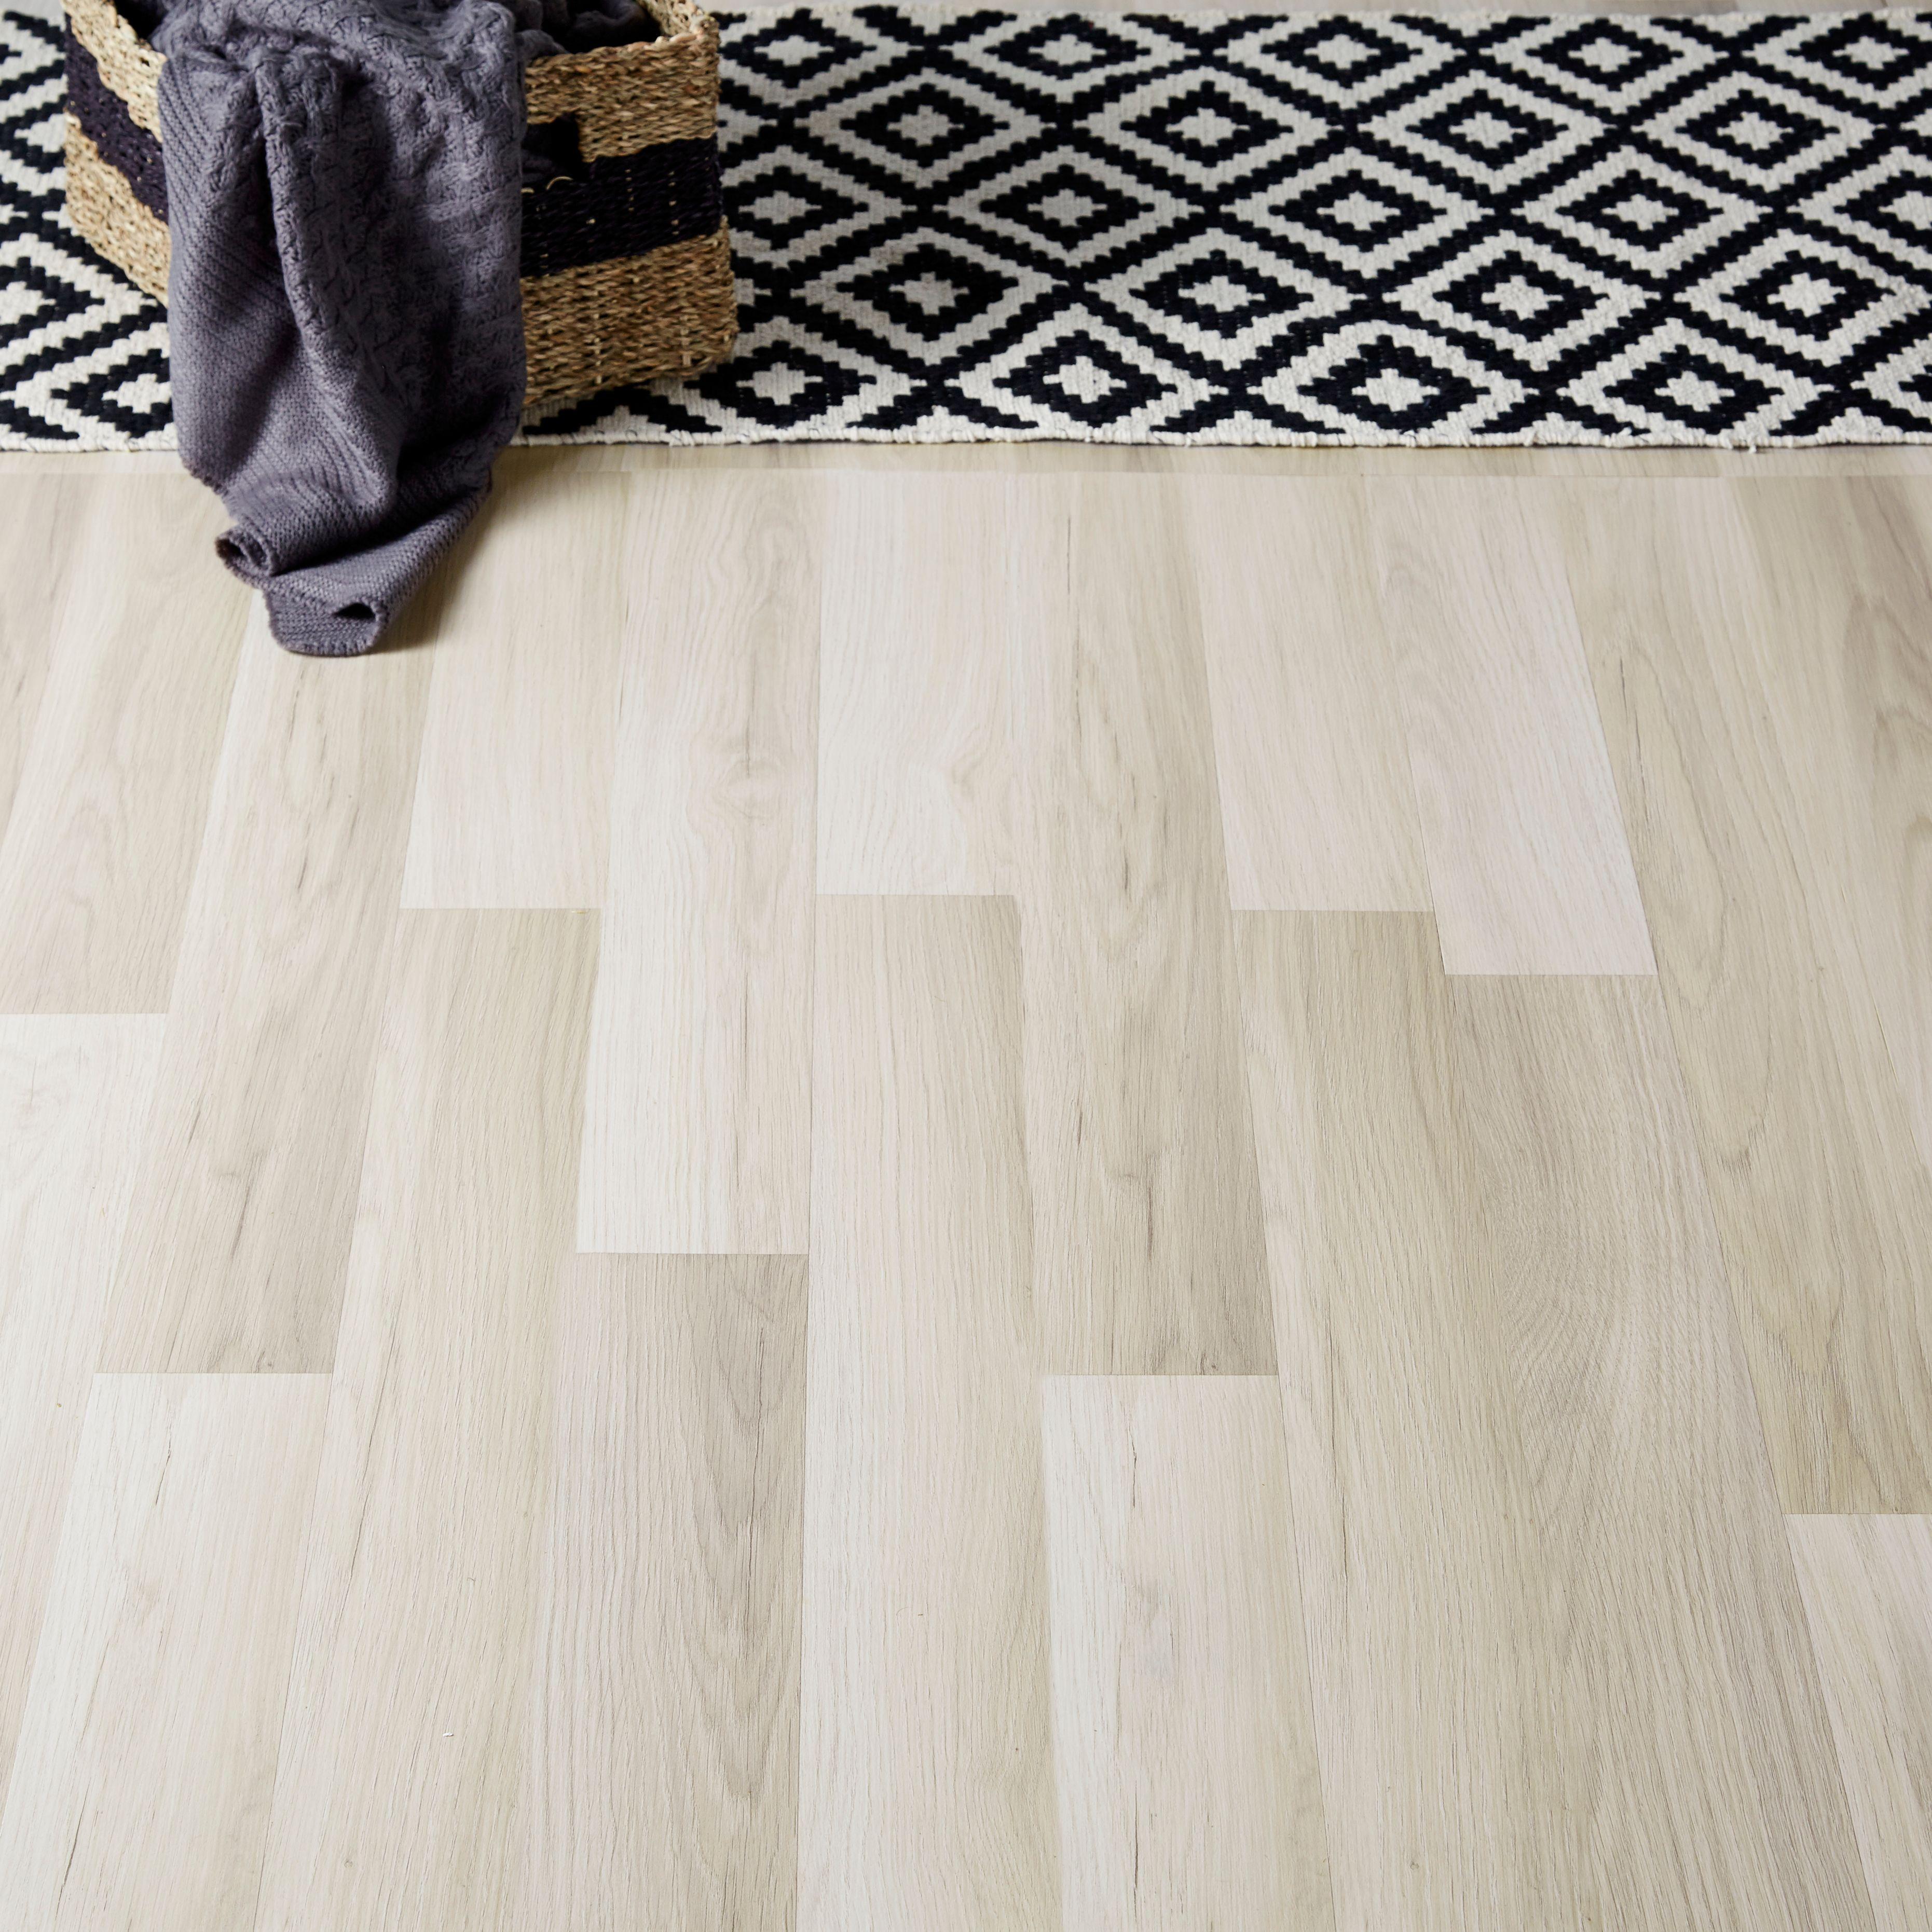 Townsville Grey Oak Effect Laminate Flooring 2 467 M² Pack Departments Diy At B Q